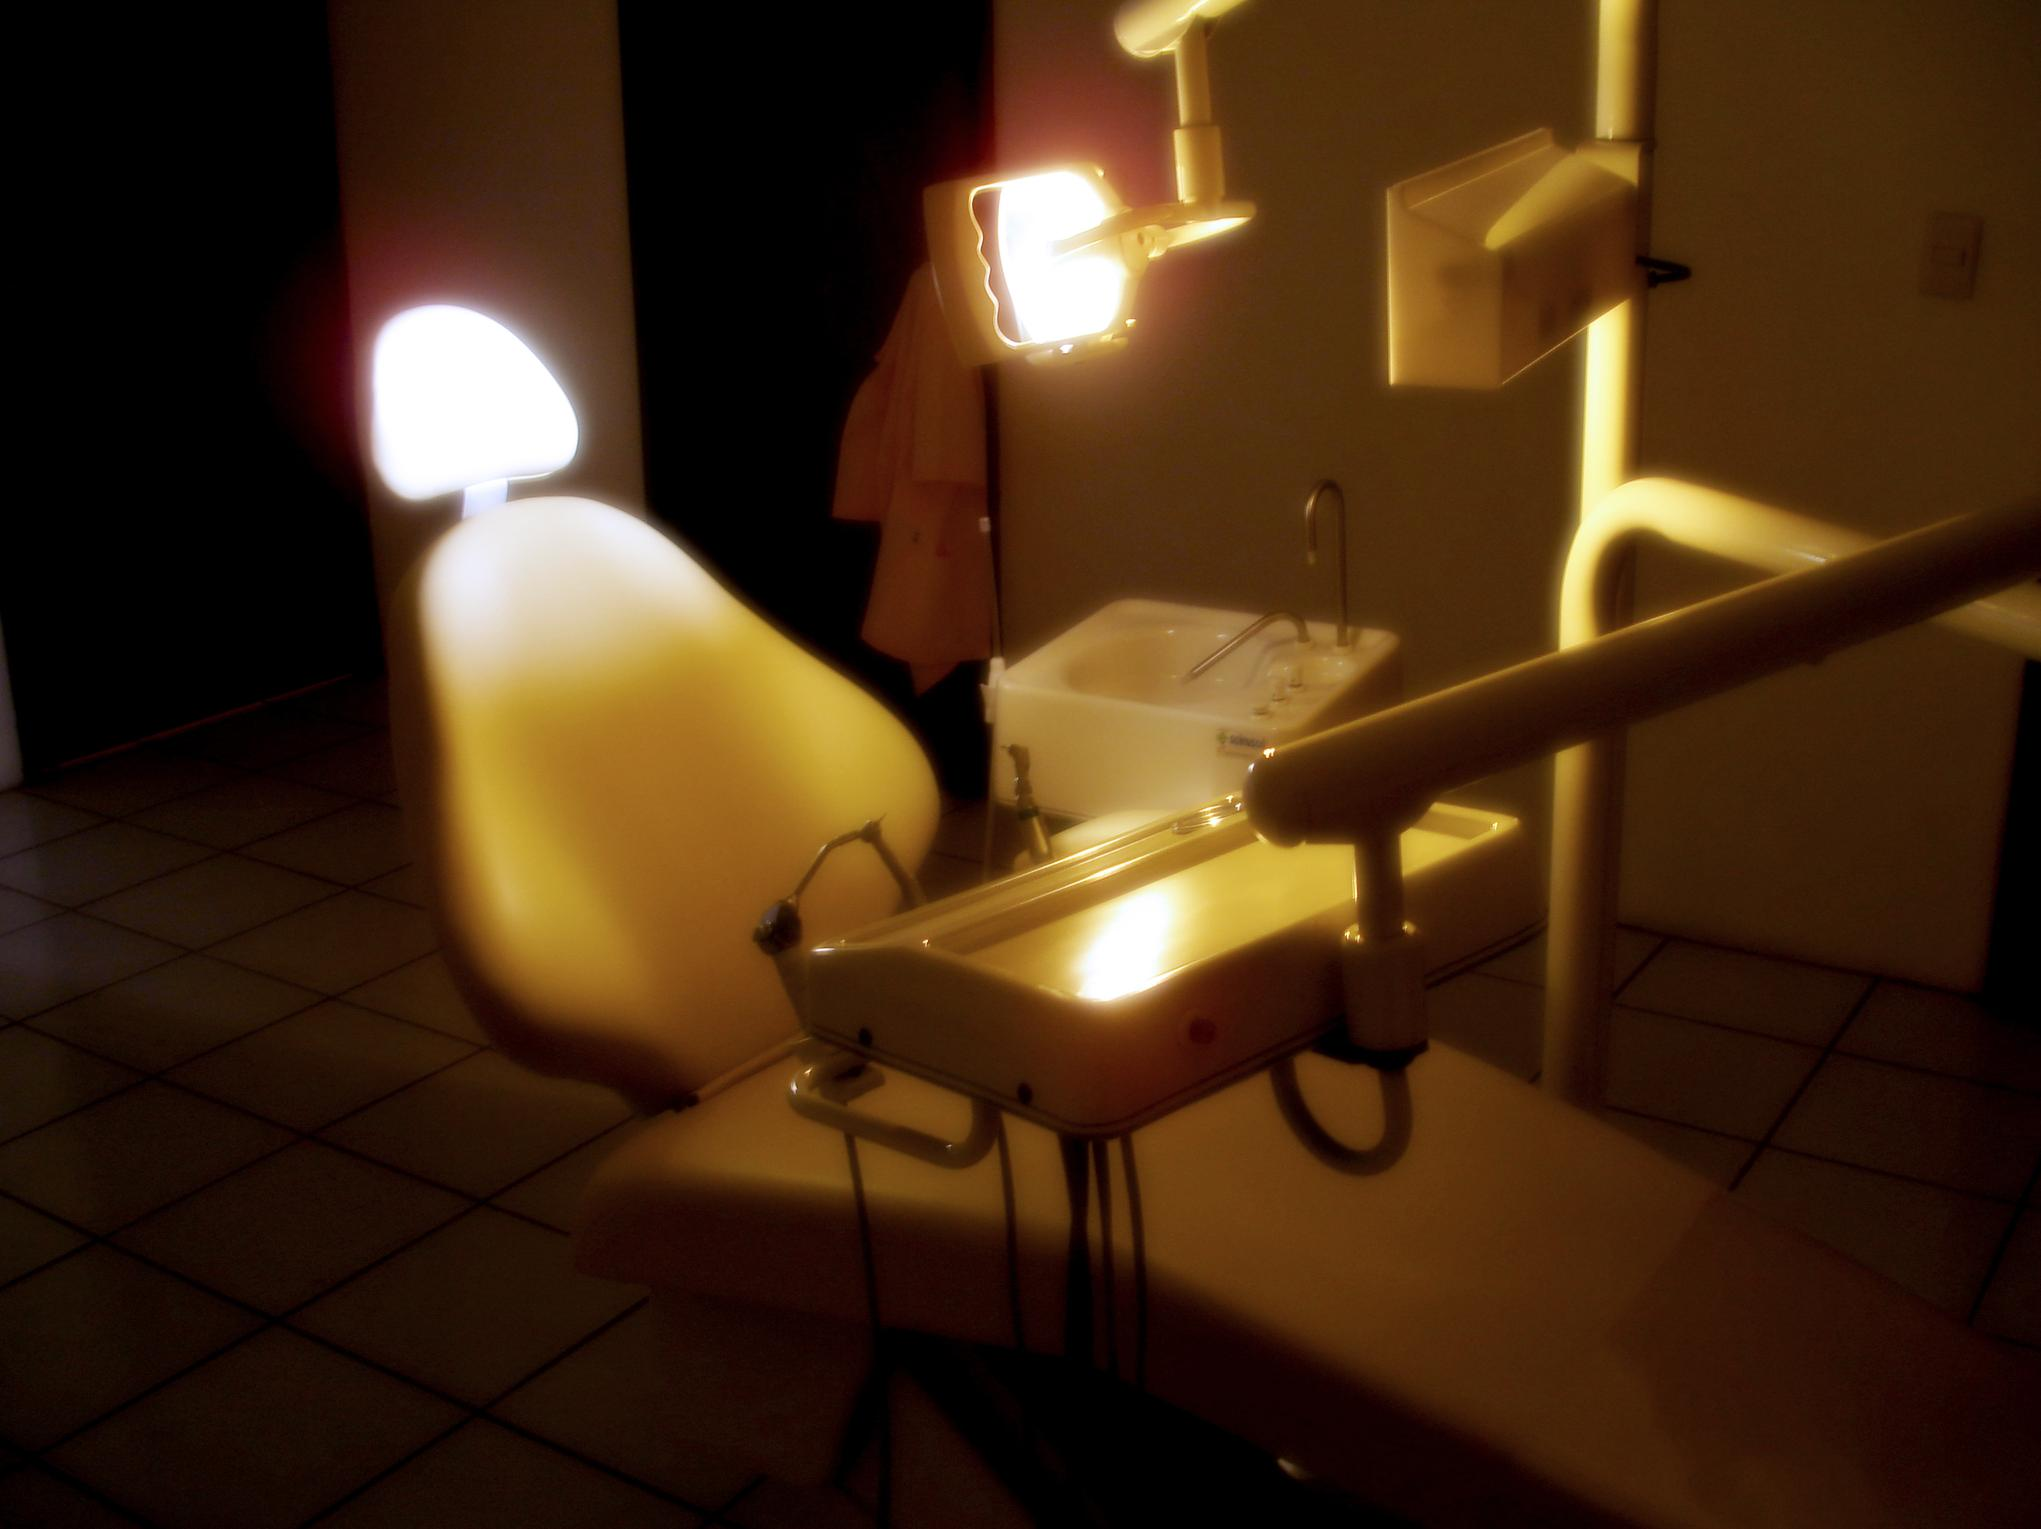 Foto 3 de Clínicas dentales en Mazarrón | Clínica Dental Olivier Houdusse